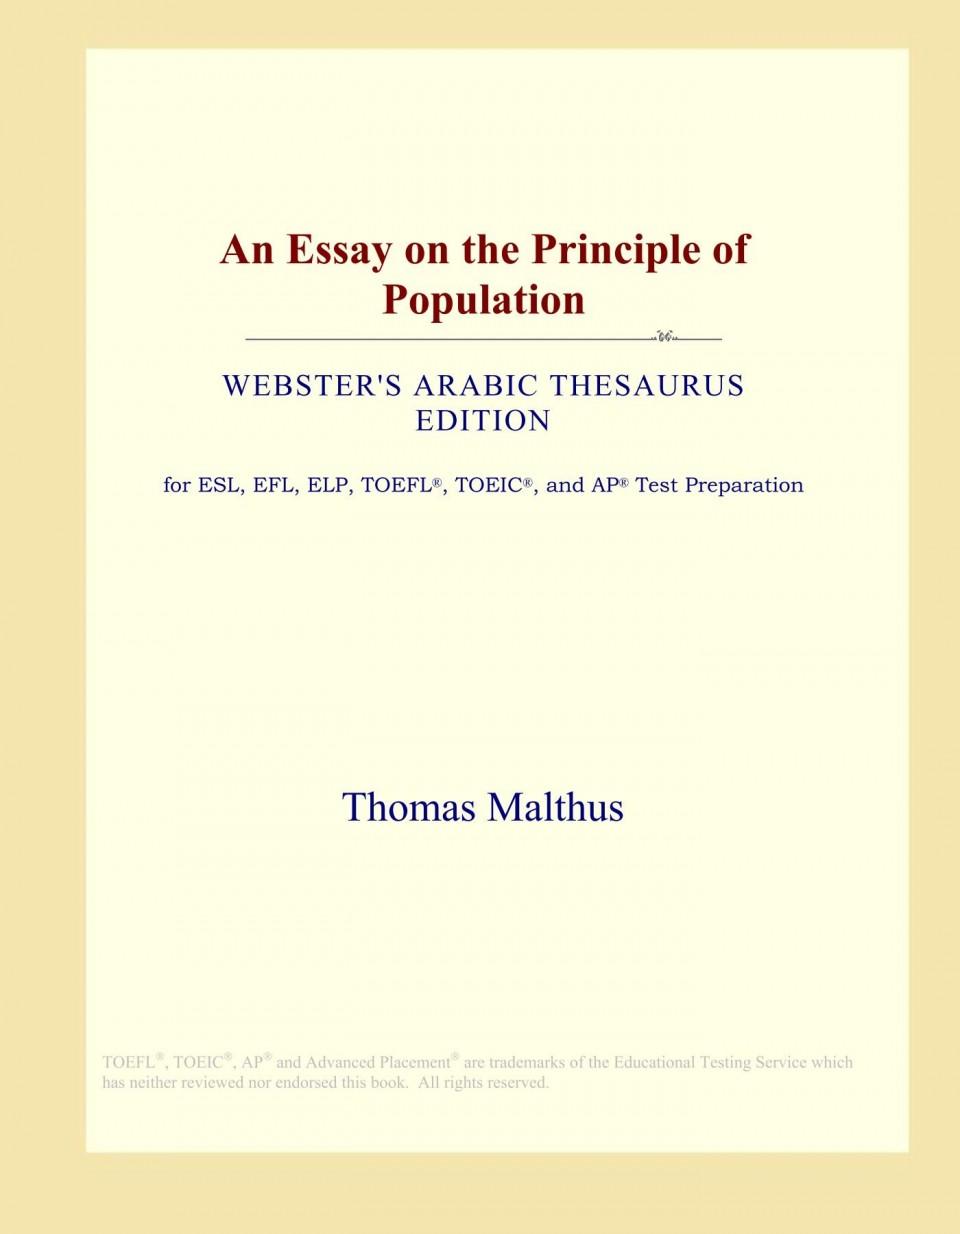 015 61groeunvgl Essay On The Principle Of Population Singular Malthus Sparknotes Thomas Main Idea 960